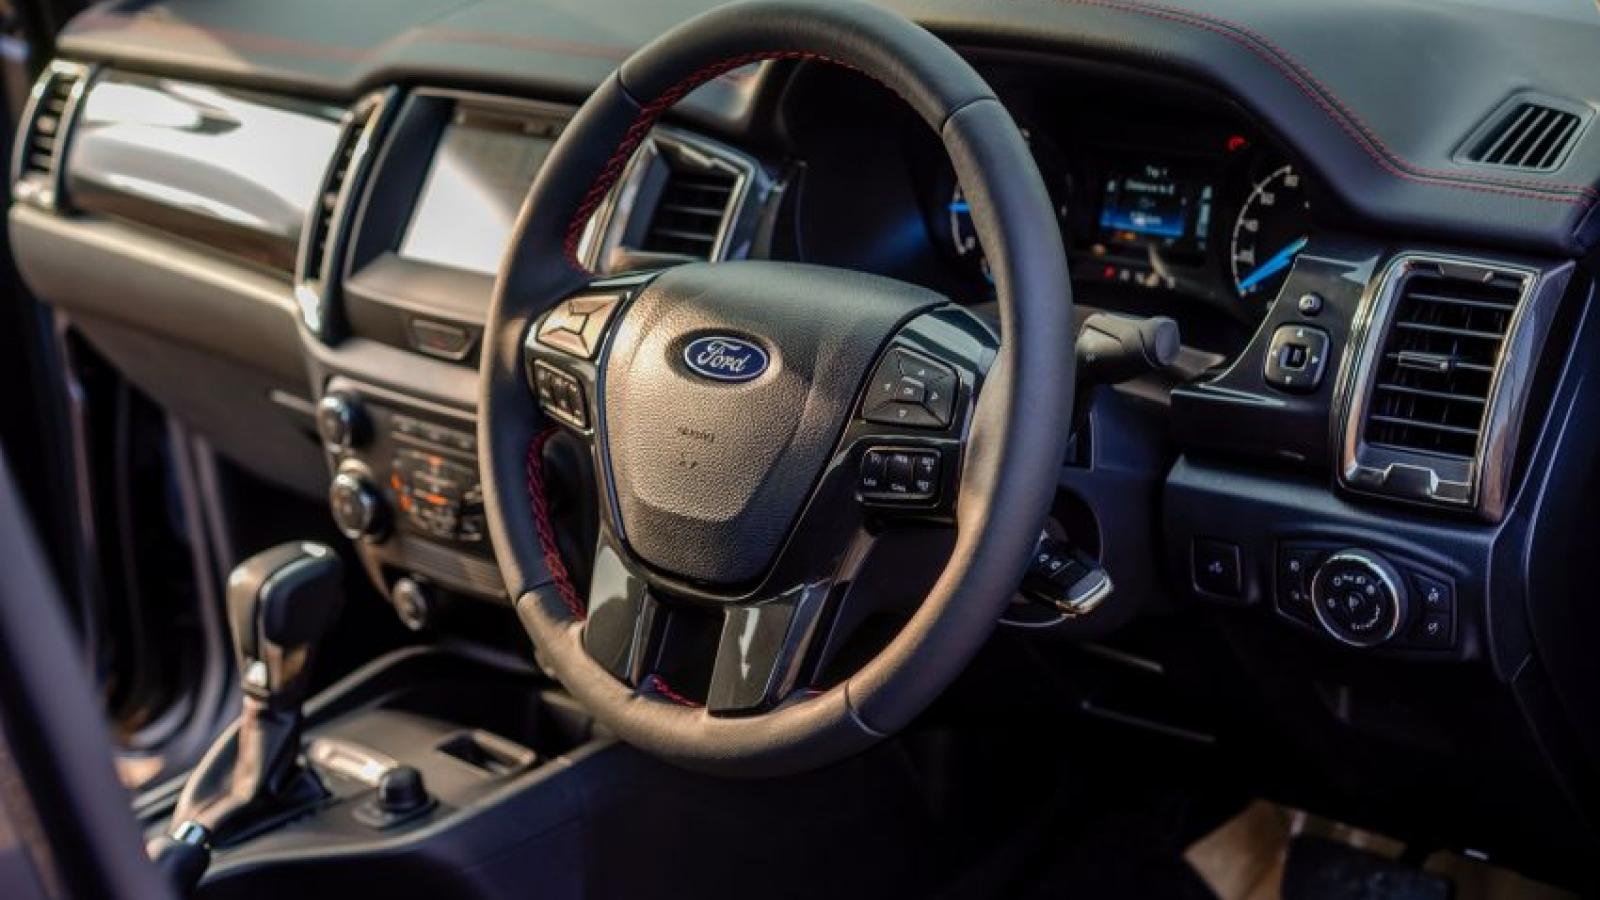 Ford phải triệu lỗi 3 triệu xe ô tô do lỗi túi khí Takata